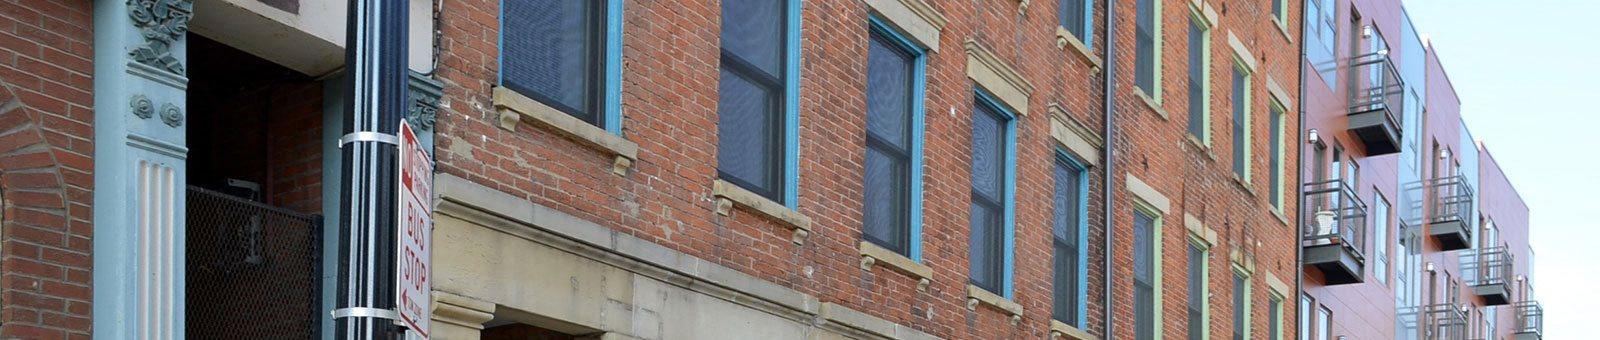 Exterior of Mercer Commons Apartments Cincinnati, OH